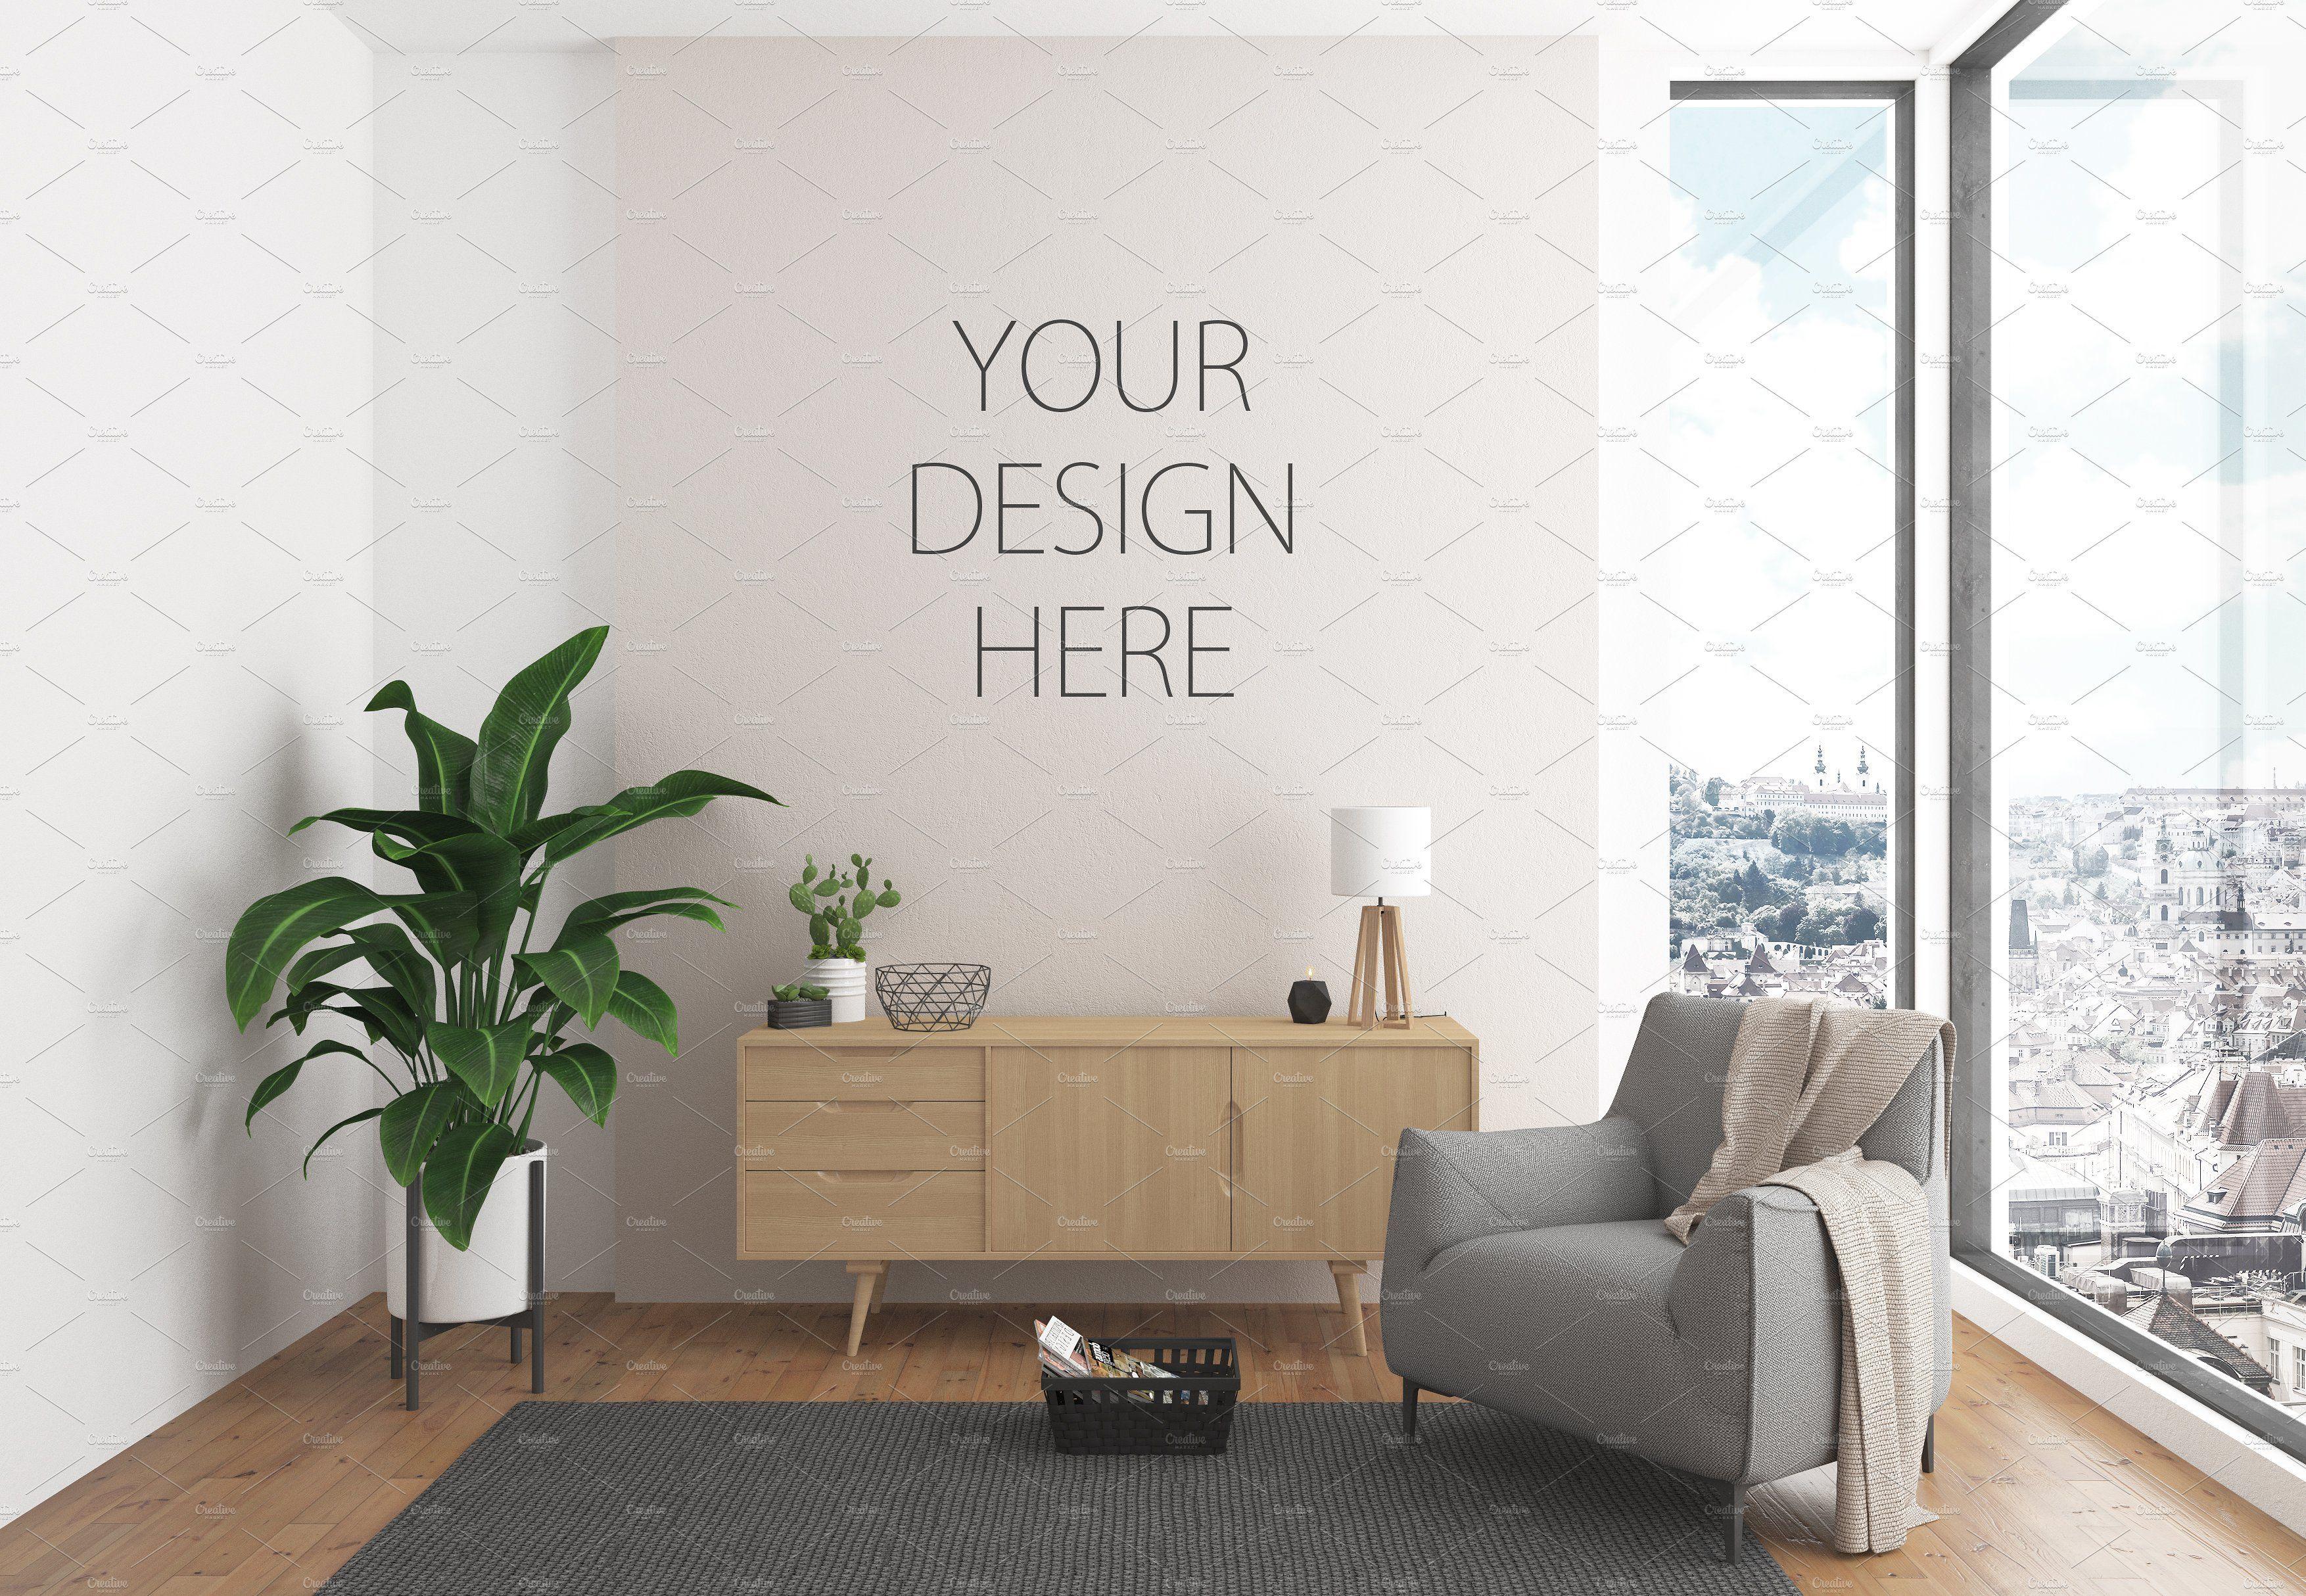 Interior Mockup Wall Art Background Scandinavian Design Desk Interior Living Room Lounge